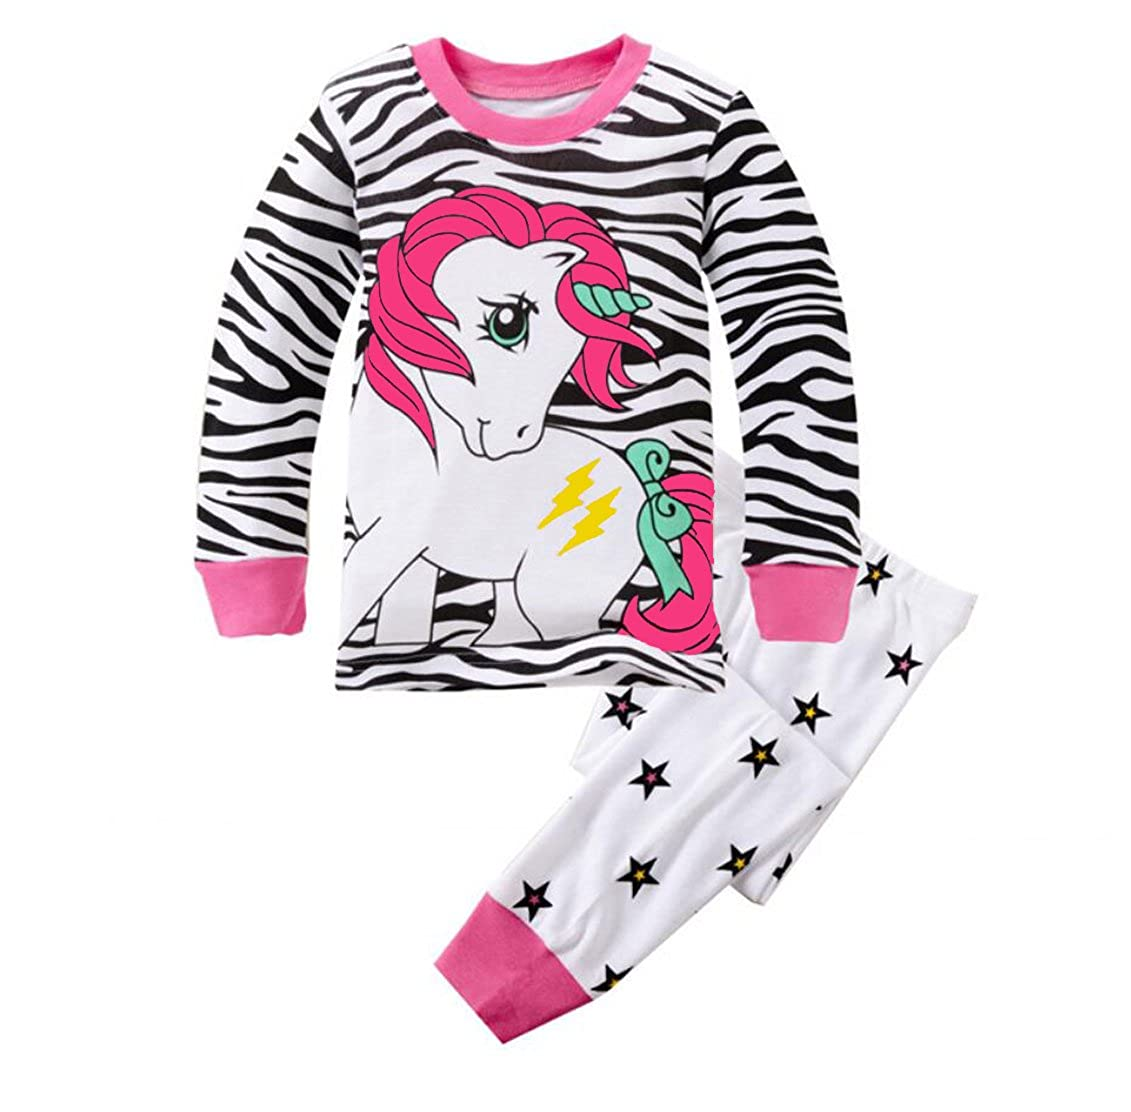 Gold treasure Little Kids Sleepwear Long Sleeve Pajama Set with Cartoon wihte Unicorn